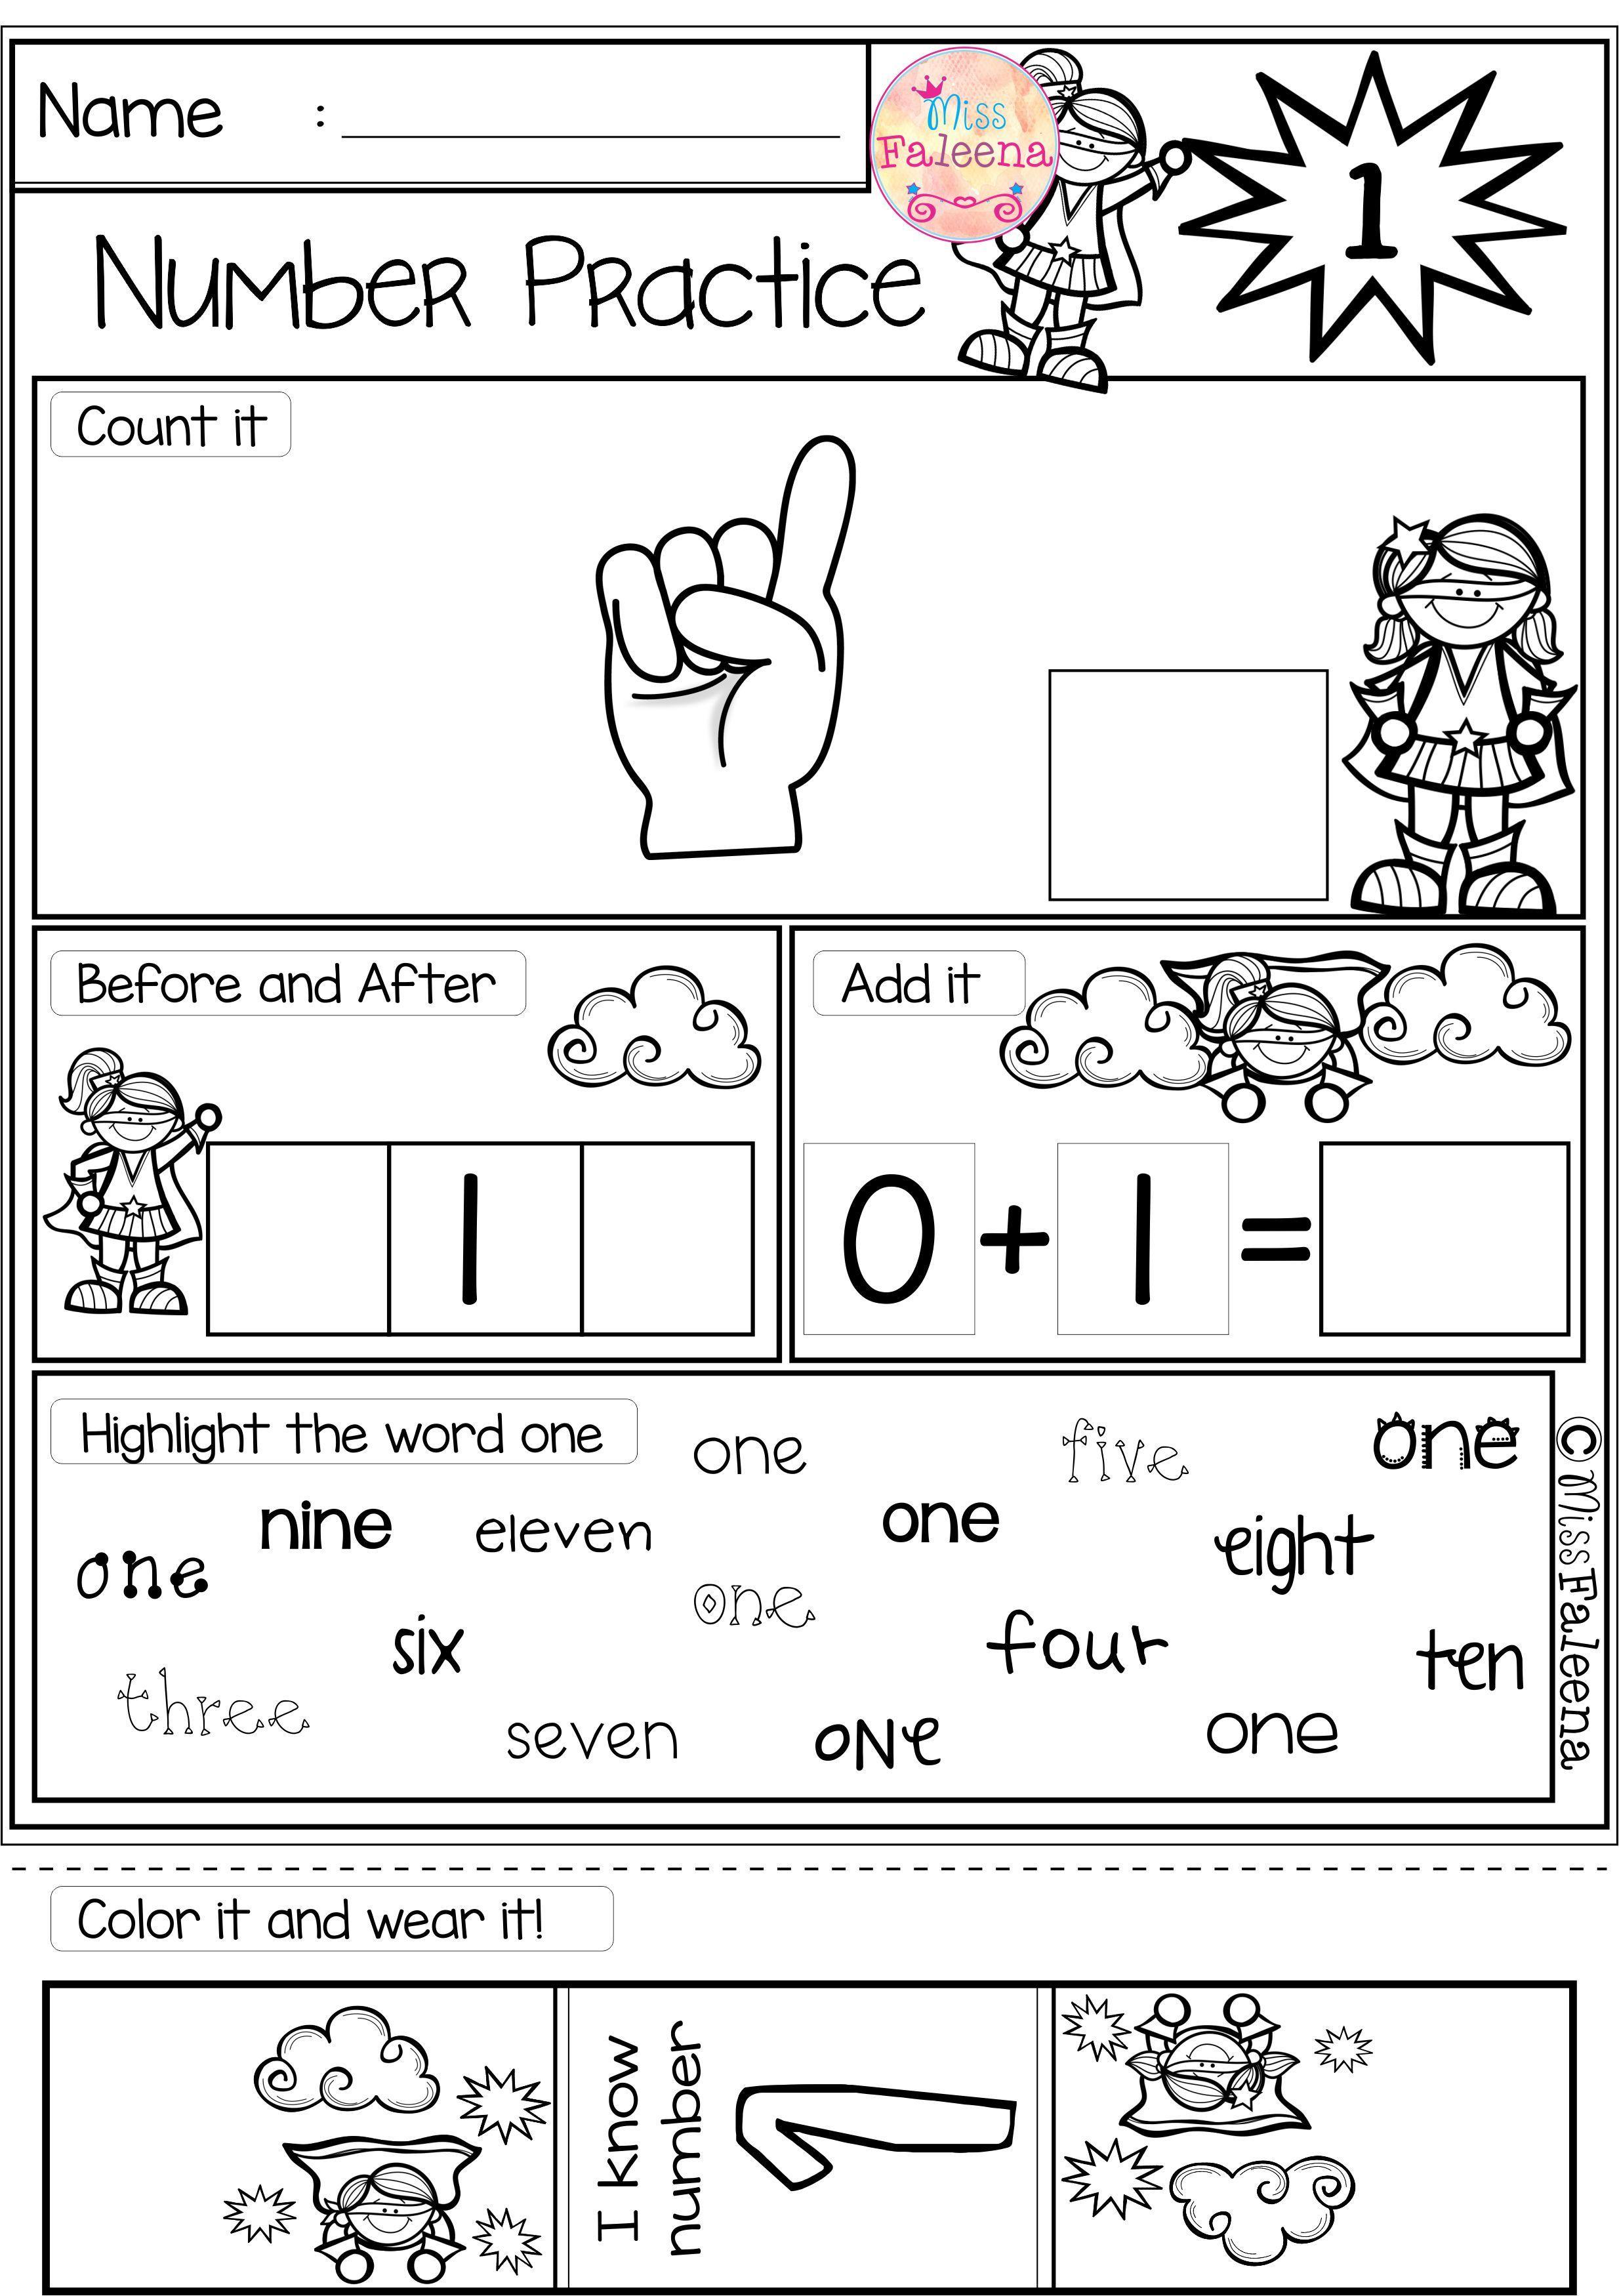 Free Math Practice Worksheets For Kindergarten